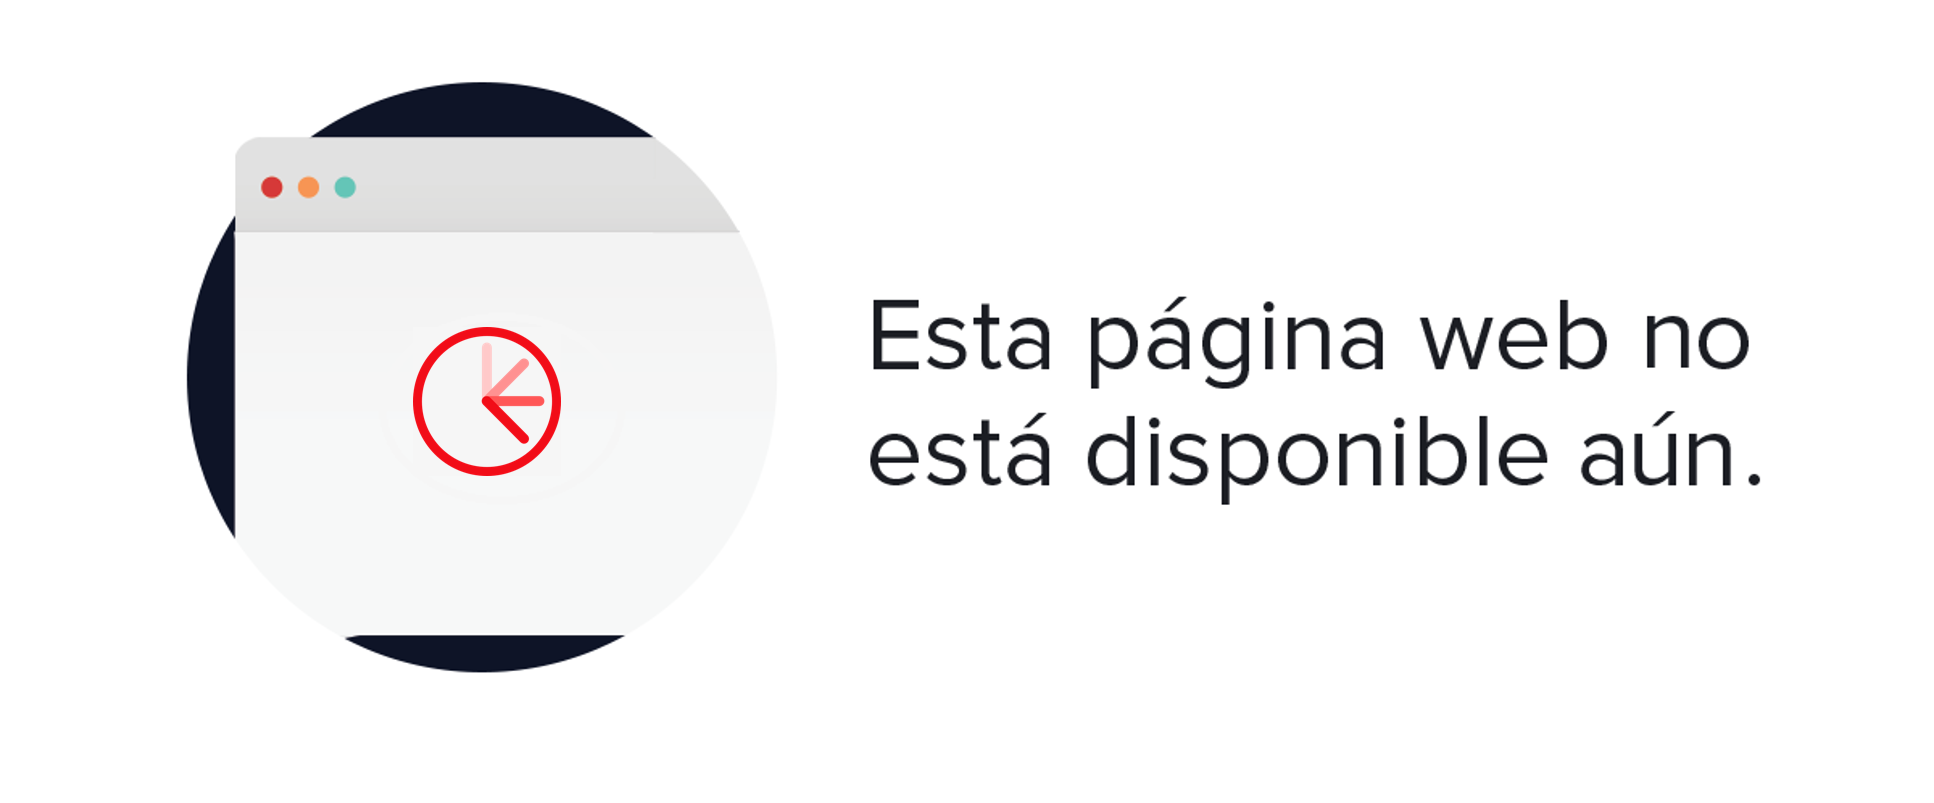 Adolfo Dominguez - Falda de mujer Adolfo Dominguez marrón asimétrica Marrón 8433917490947 - UQPBOWE